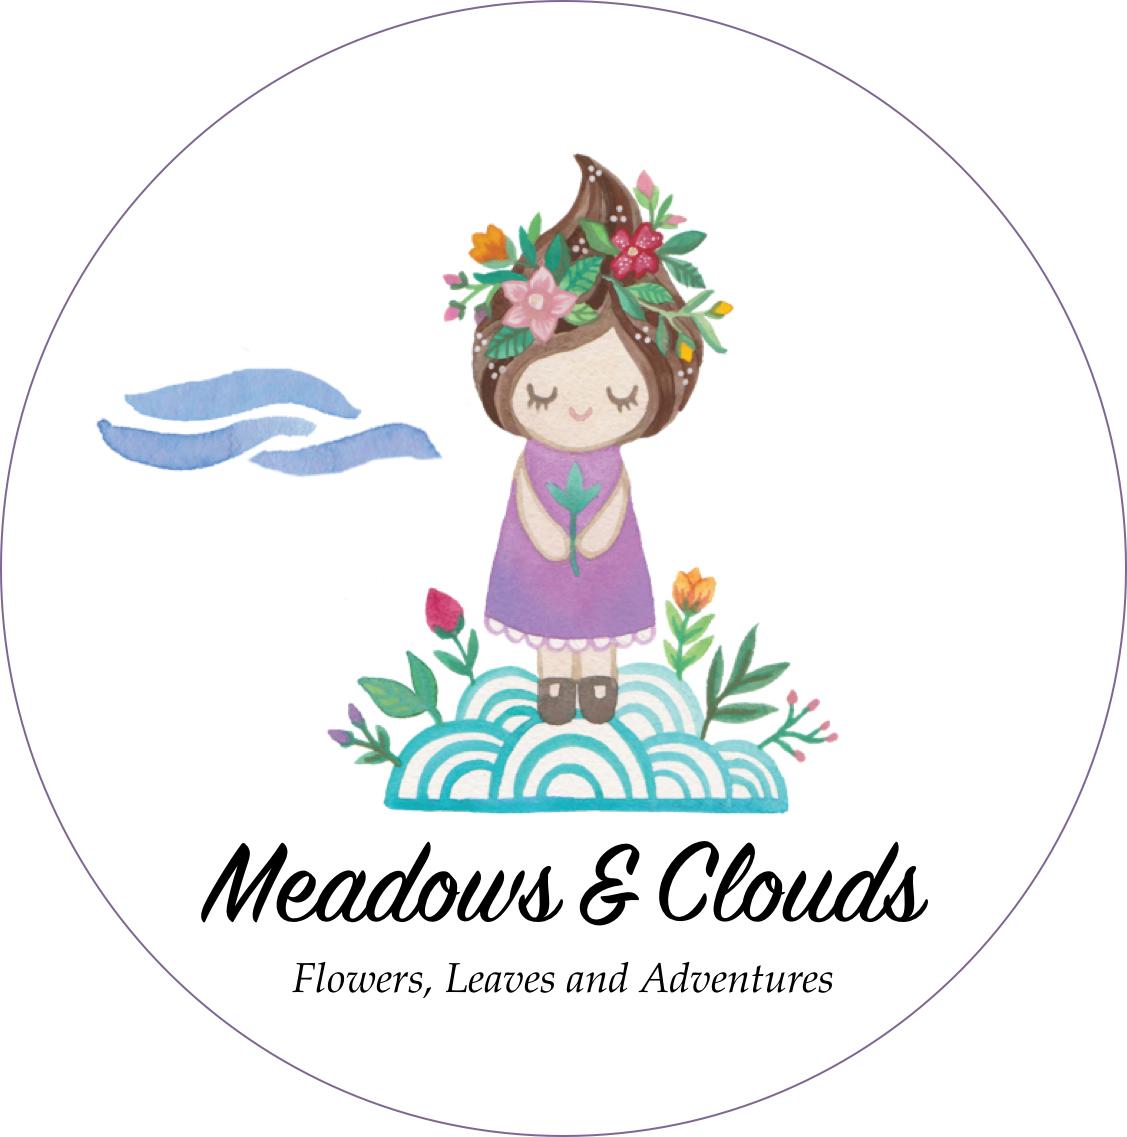 Meadows & Clouds logo